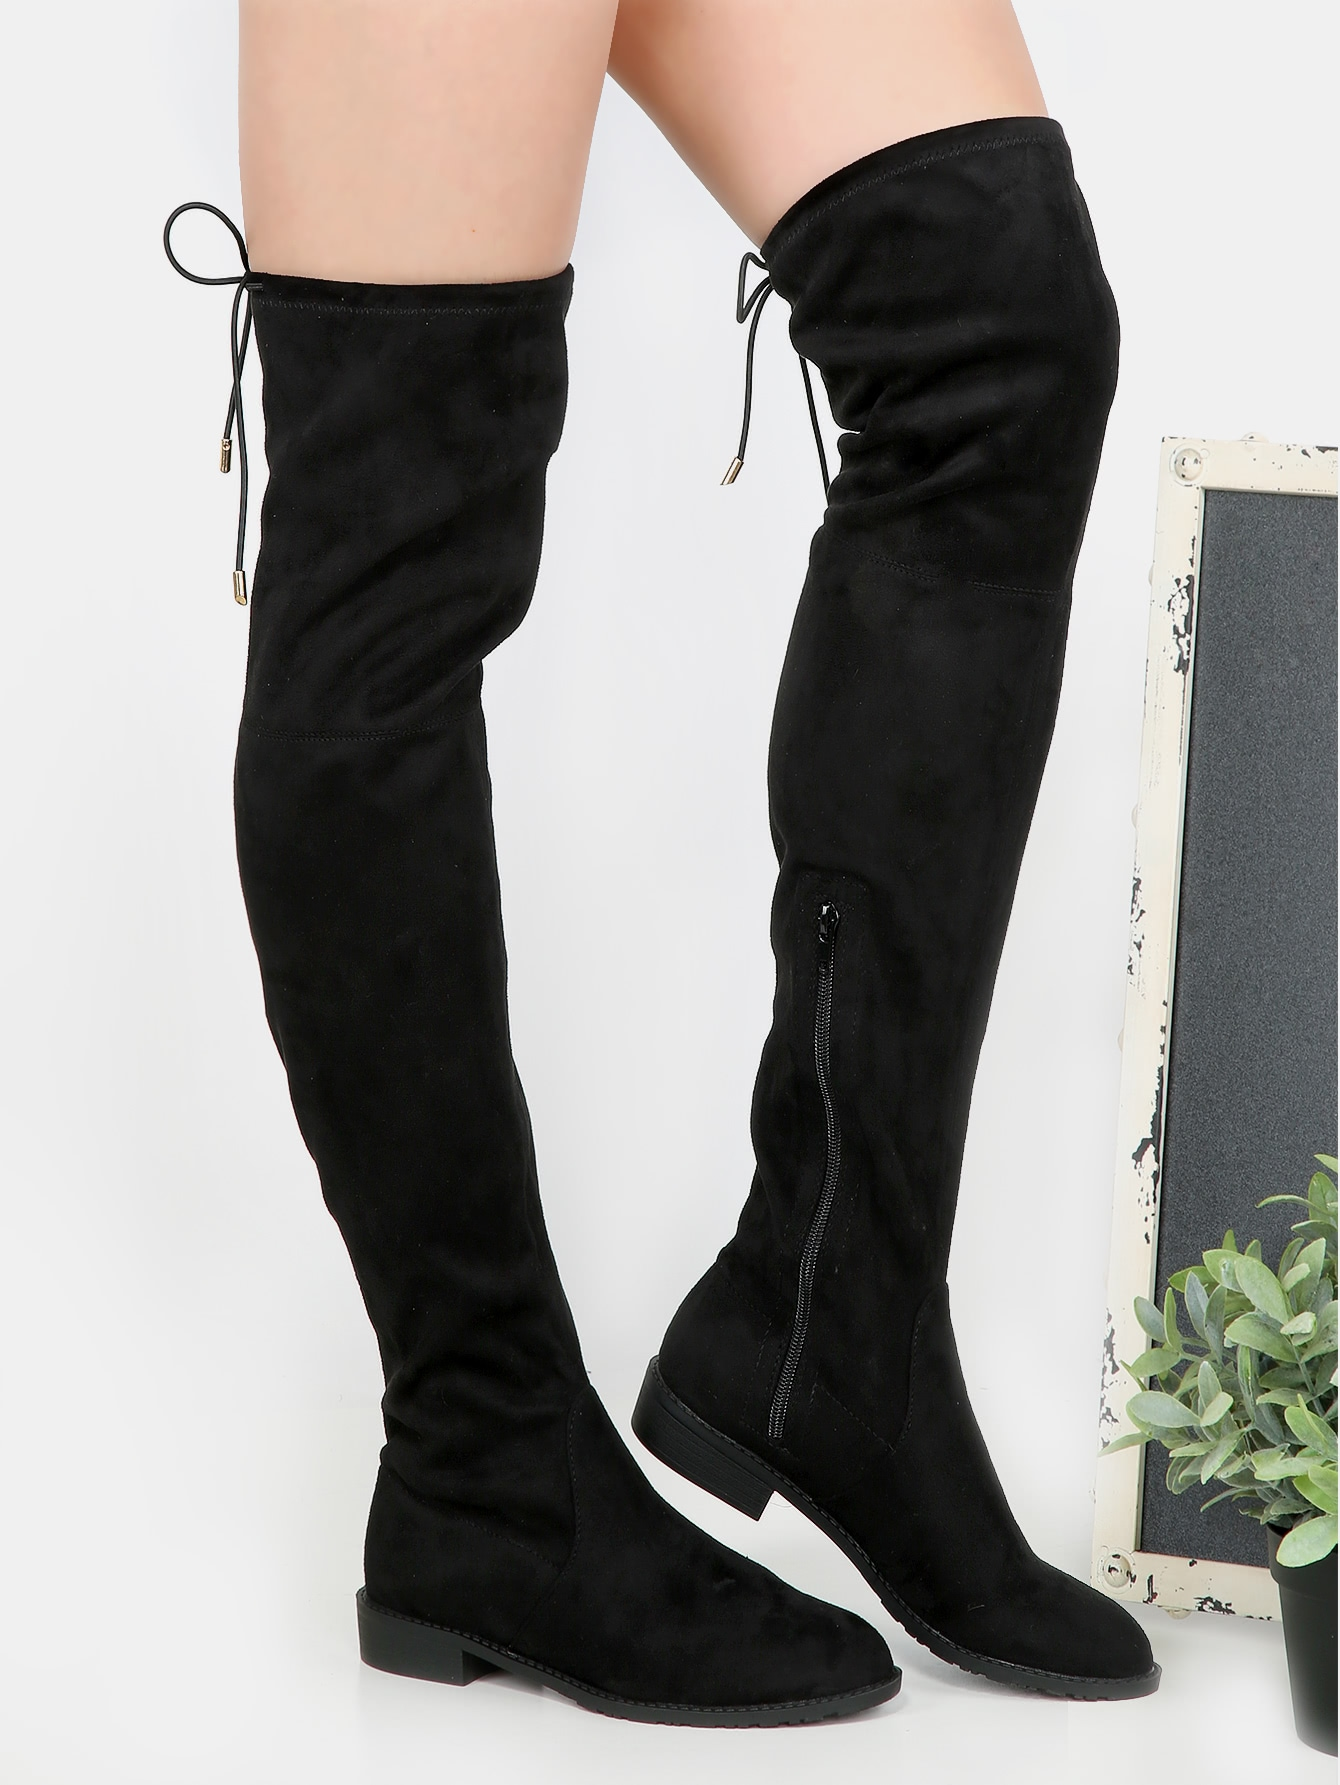 Flat Heel Thigh High Boots BLACK -SheIn(Sheinside)